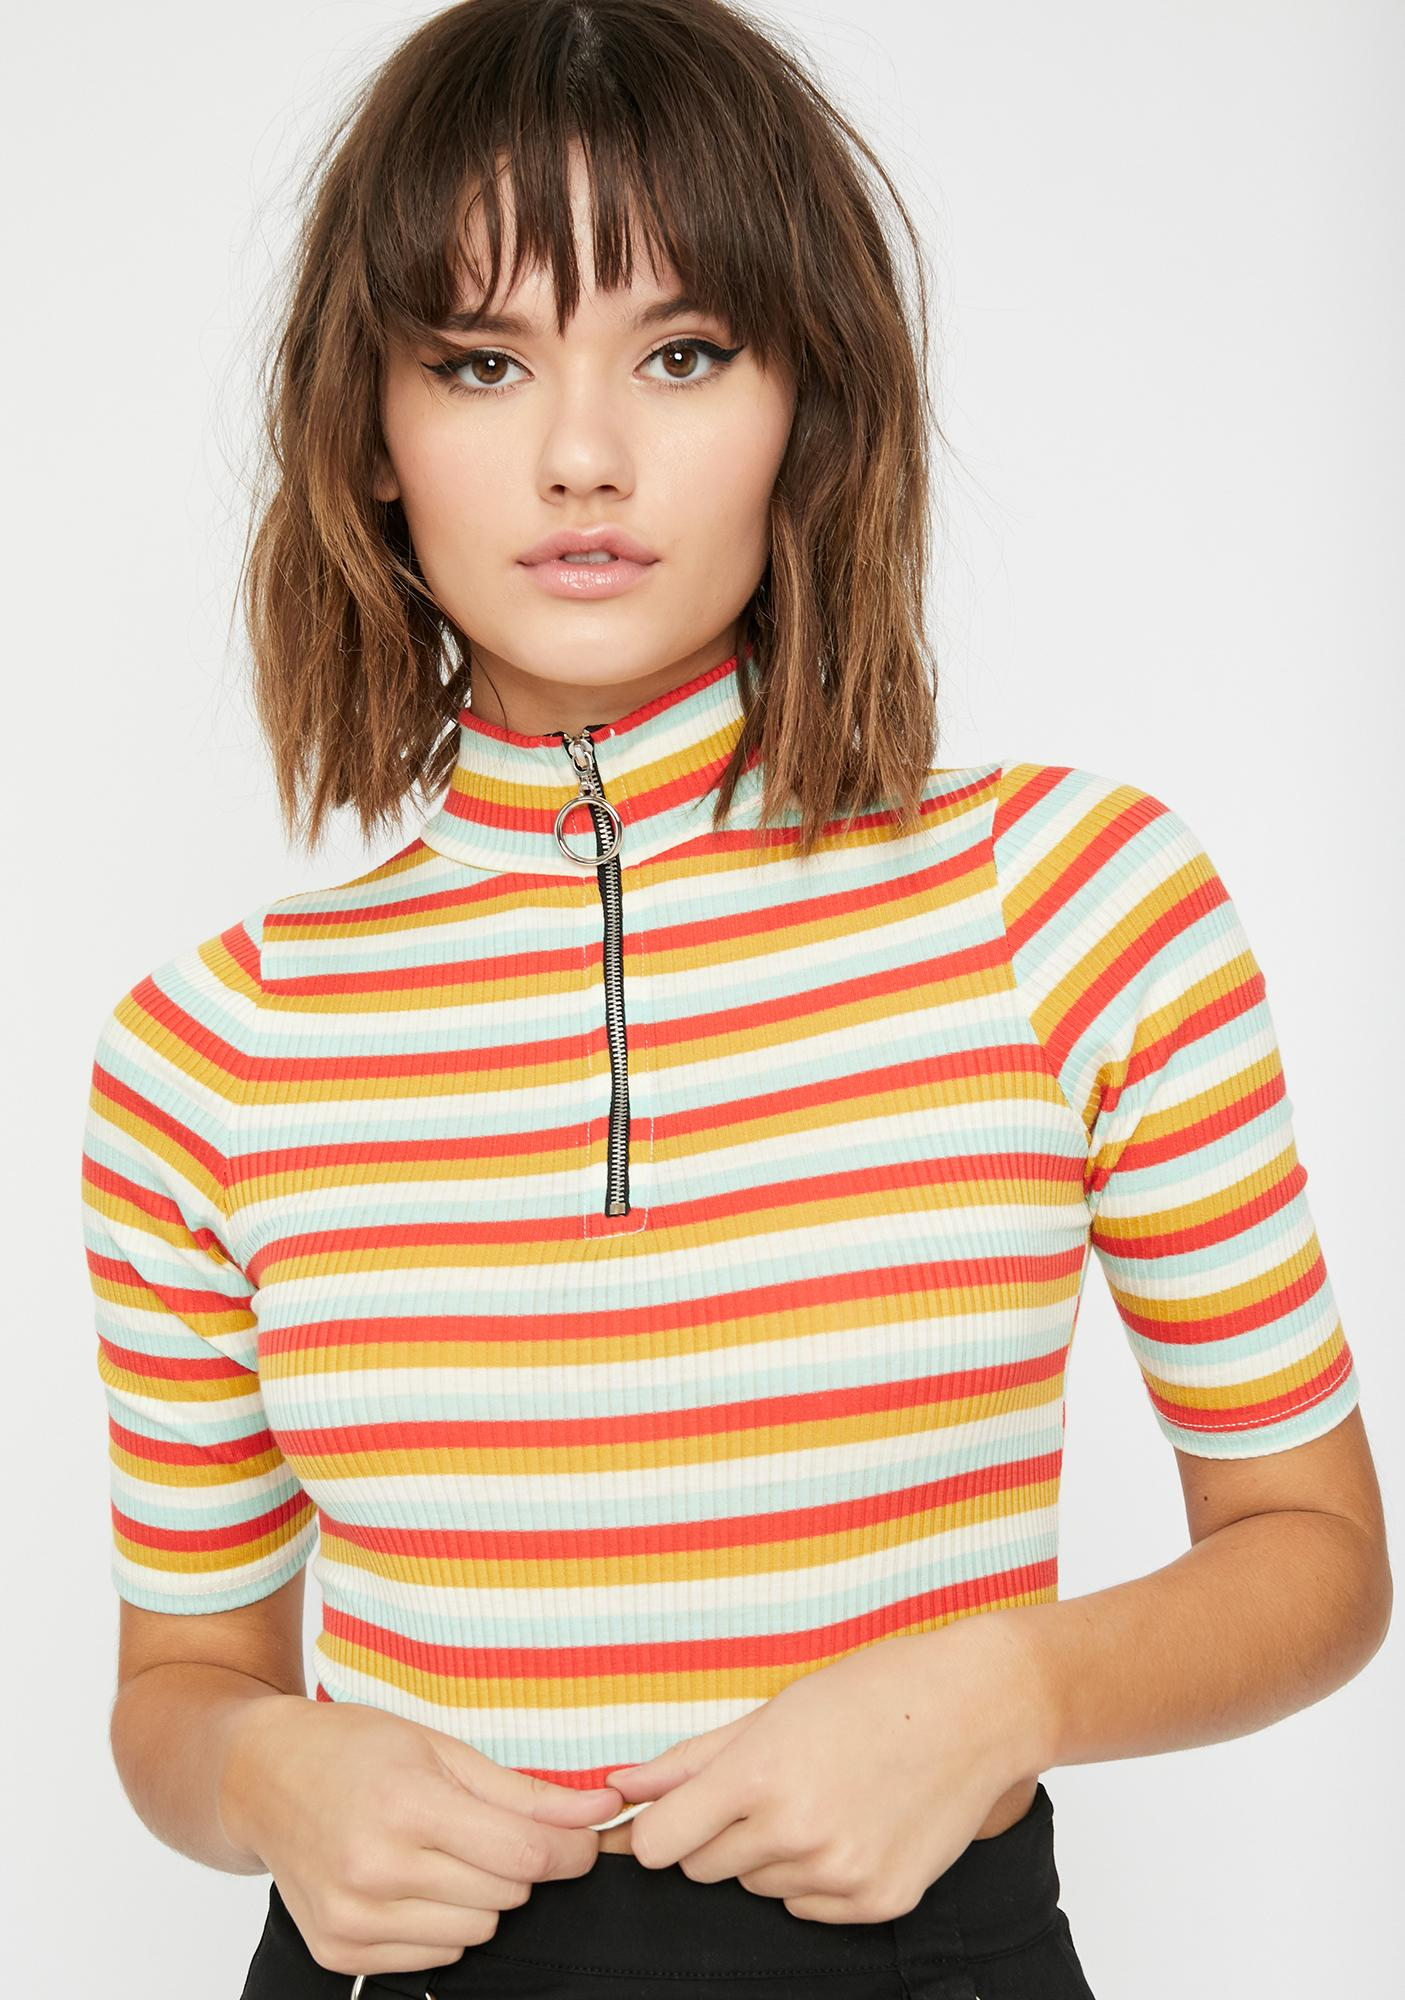 Vibrant Slay Striped Top